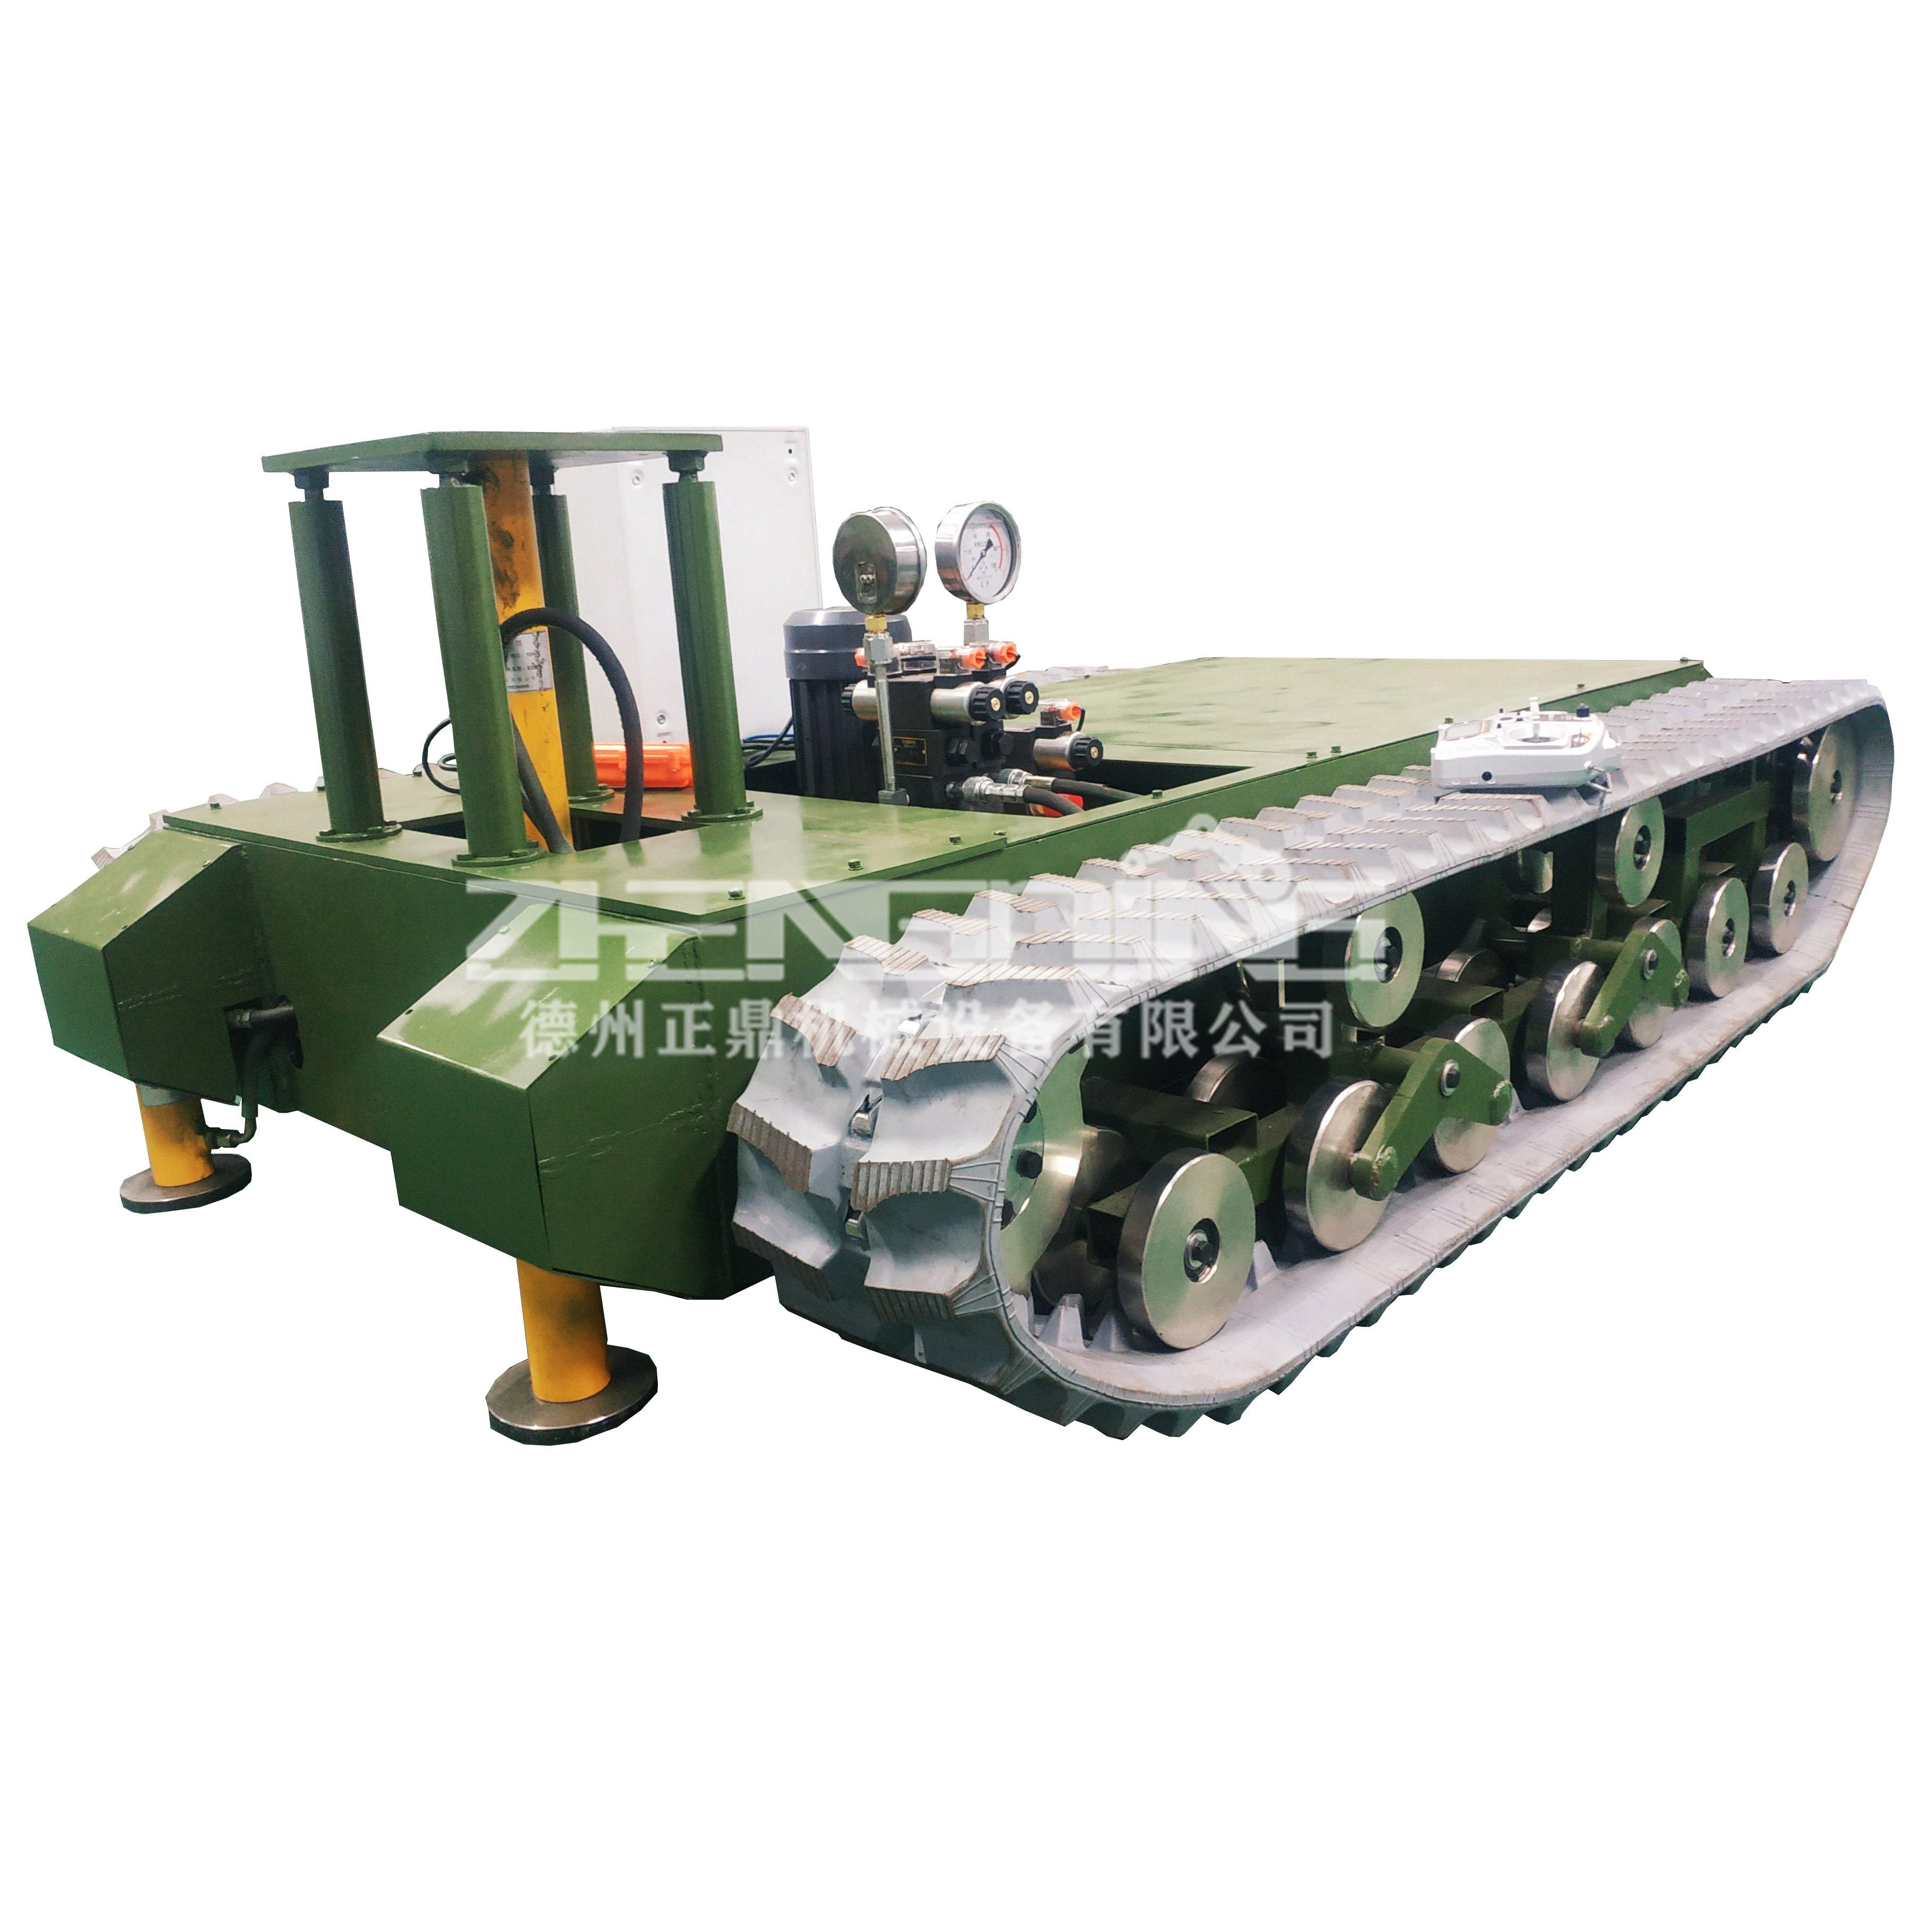 ZDDP-AHMG-250橡胶履带底盘